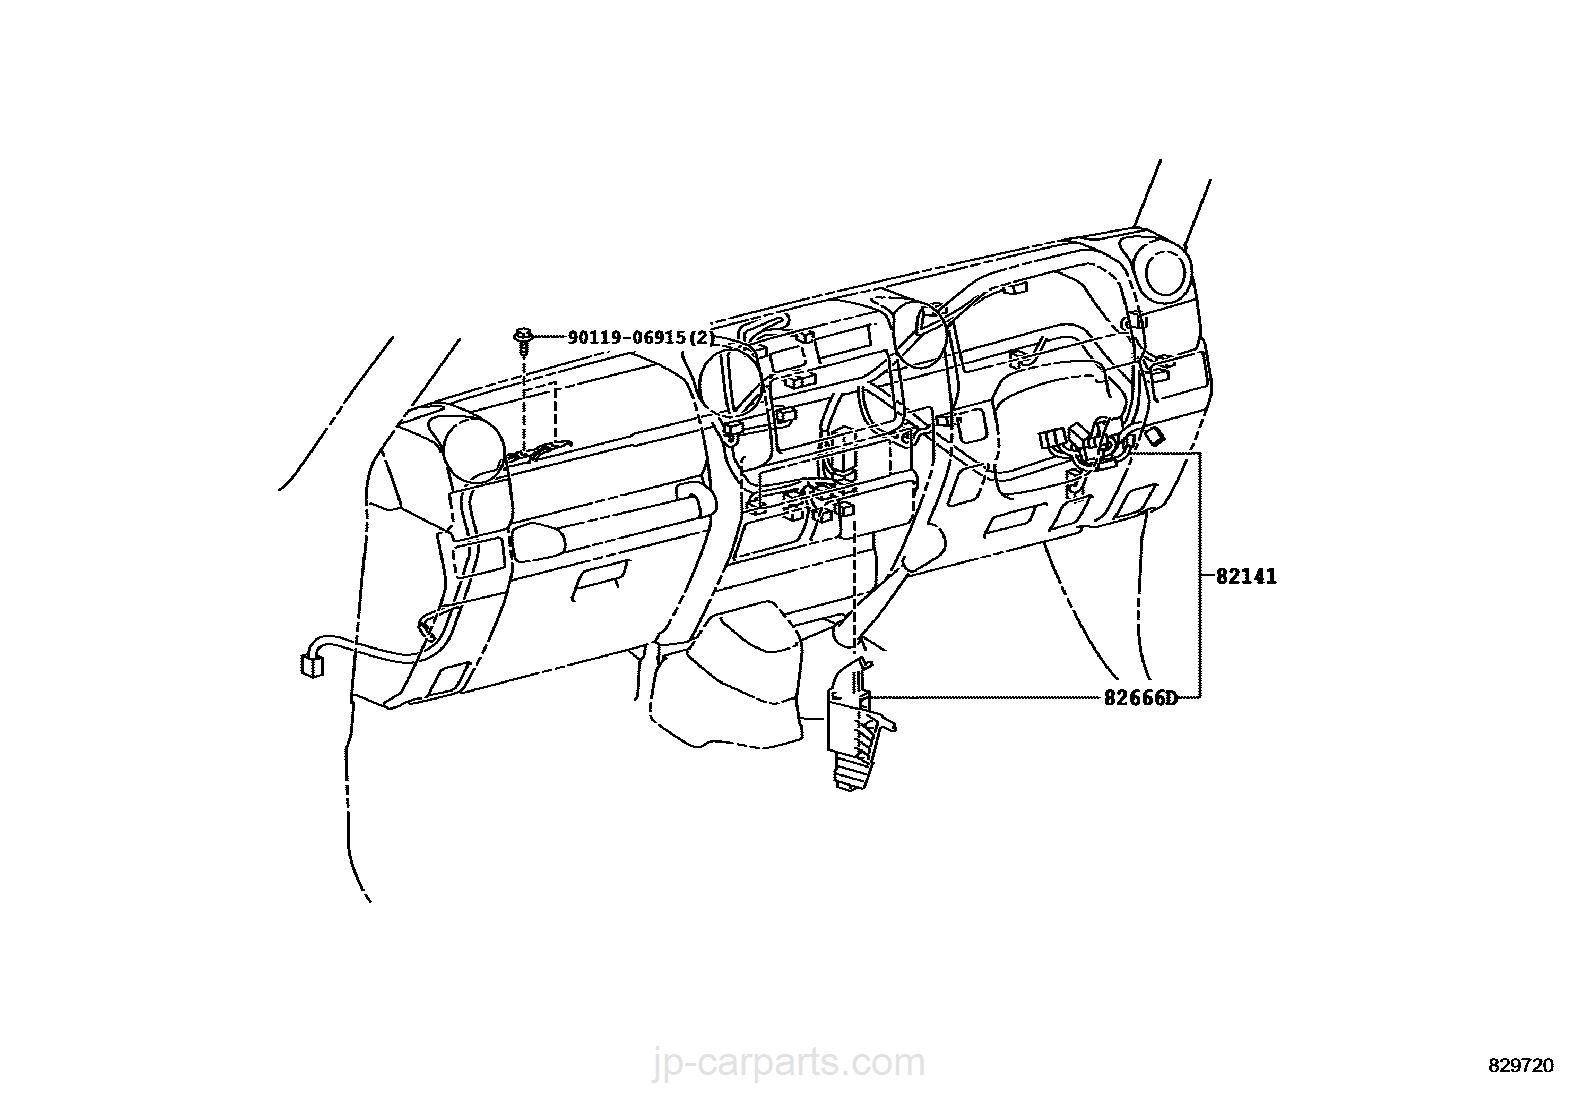 Wiring Amp Clamp Toyota